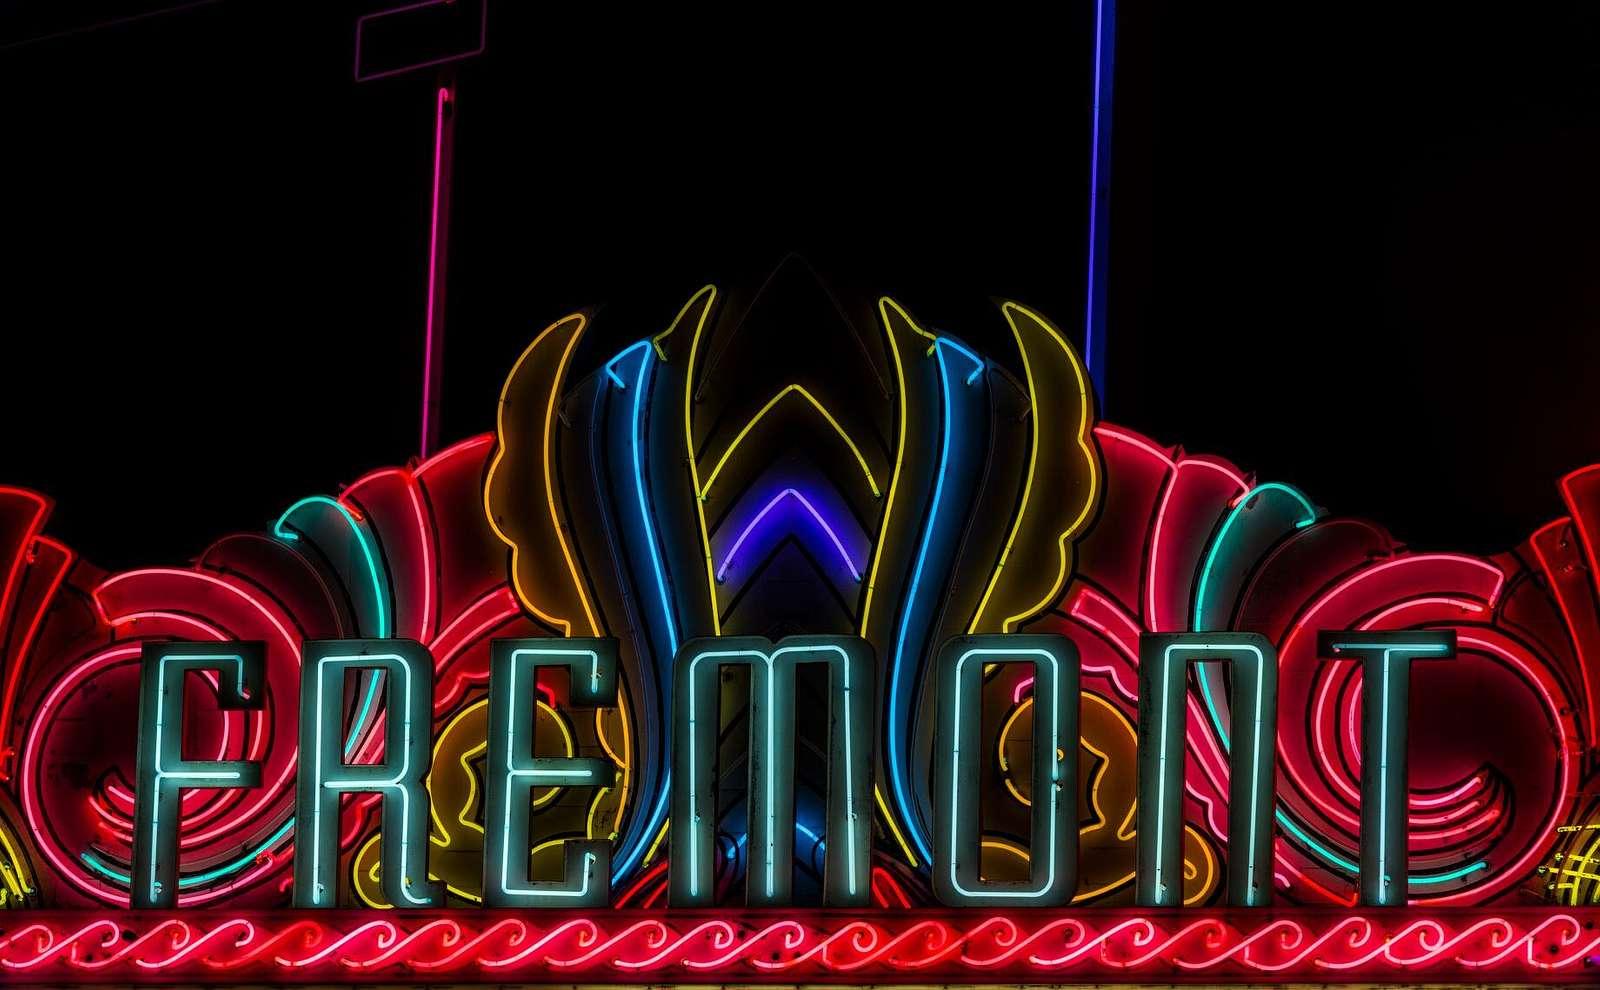 Neon marquee of the Fremont Theater in San Luis Obispo, California